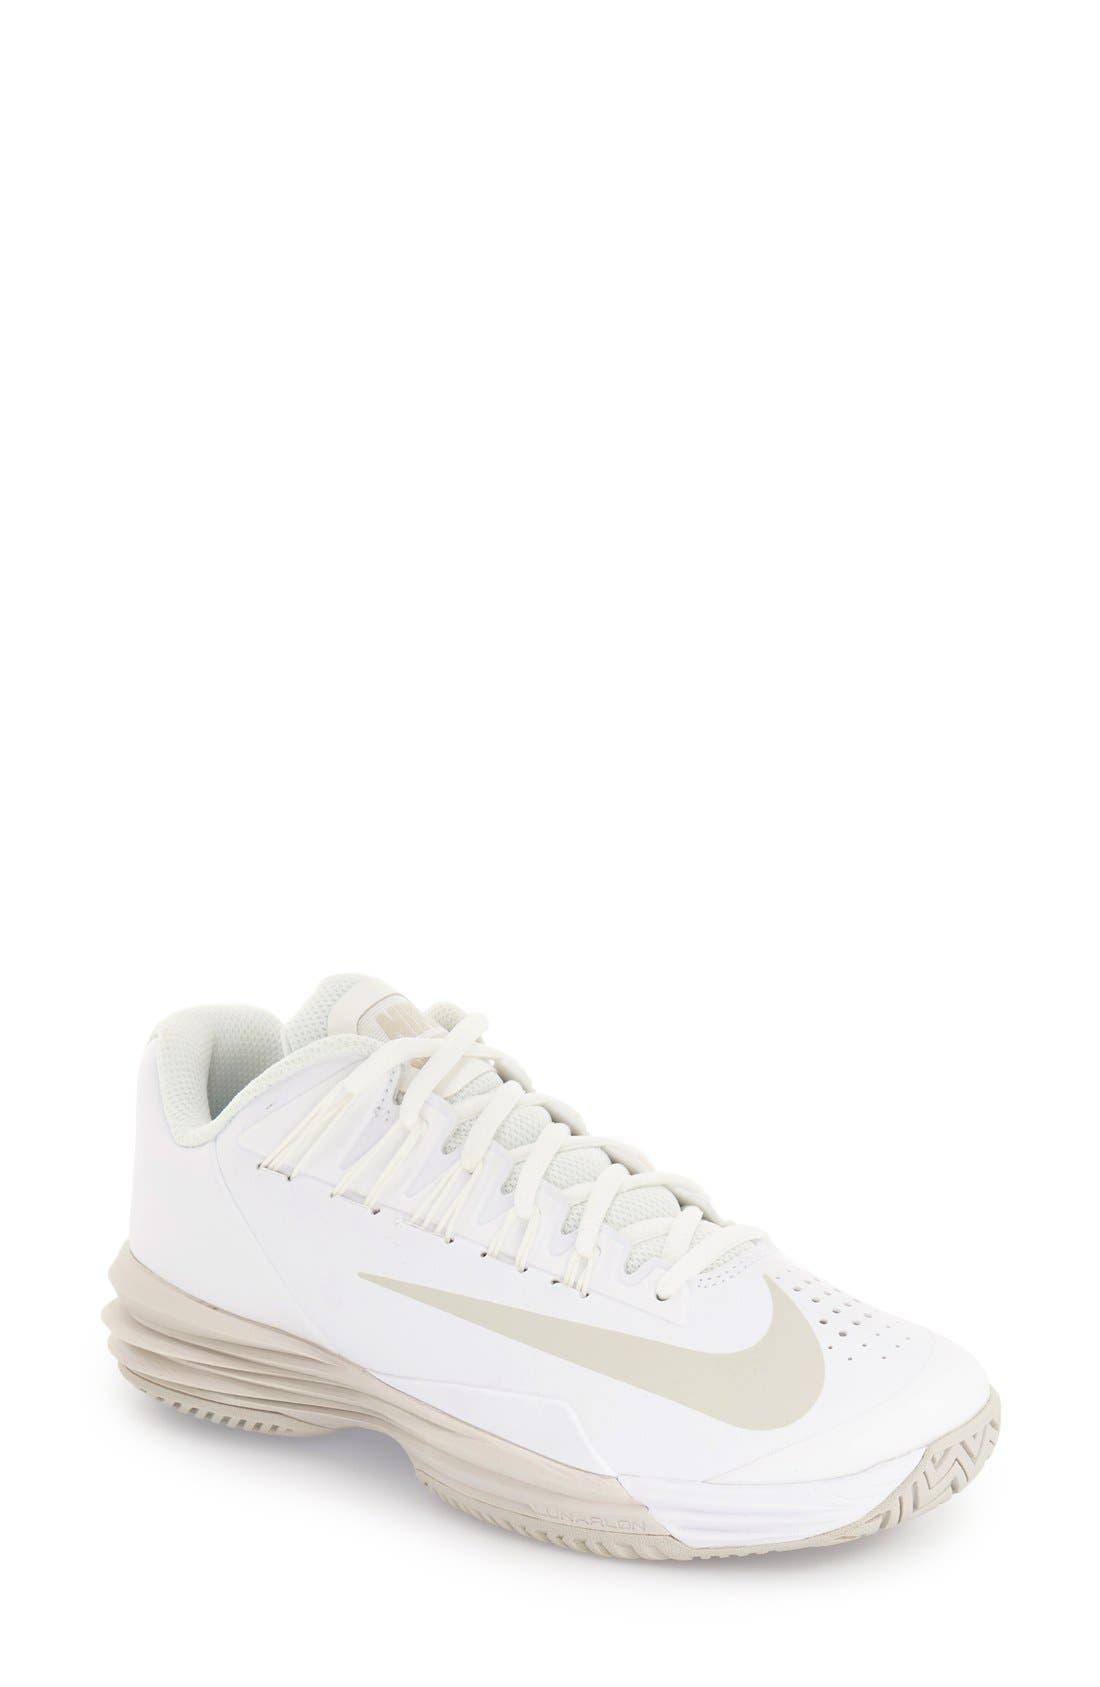 Alternate Image 1 Selected - Nike 'Lunar Ballistec 1.5' Tennis Shoe (Women)